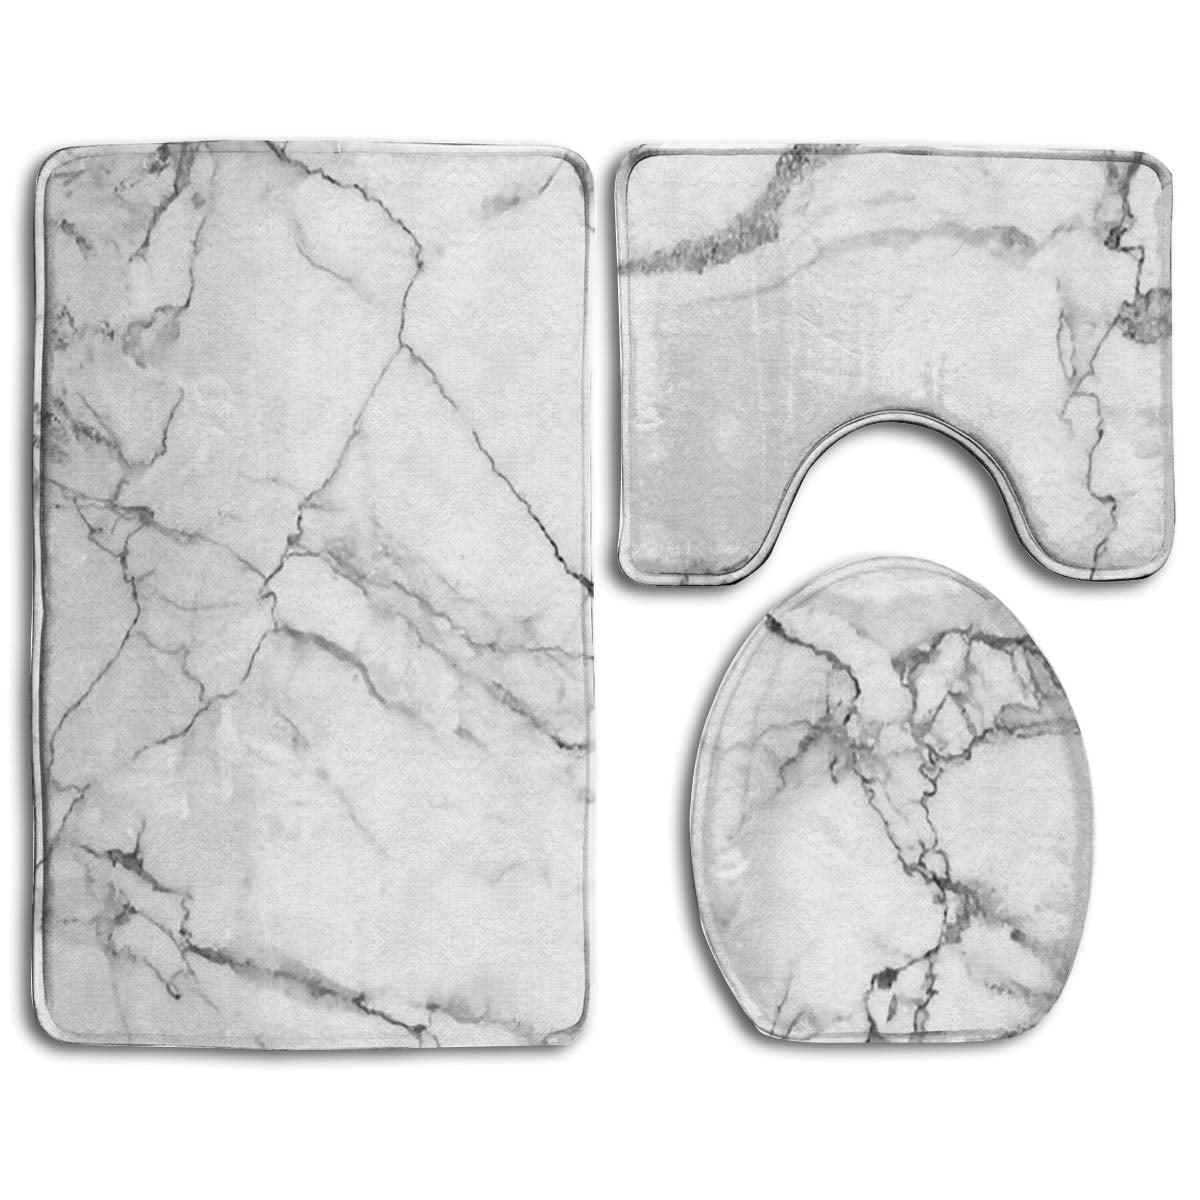 Picture of: Gohao Gray White Marbling Texture 3 Piece Bathroom Rugs Set Bath Rug Contour Mat And Toilet Lid Cover Walmart Com Walmart Com